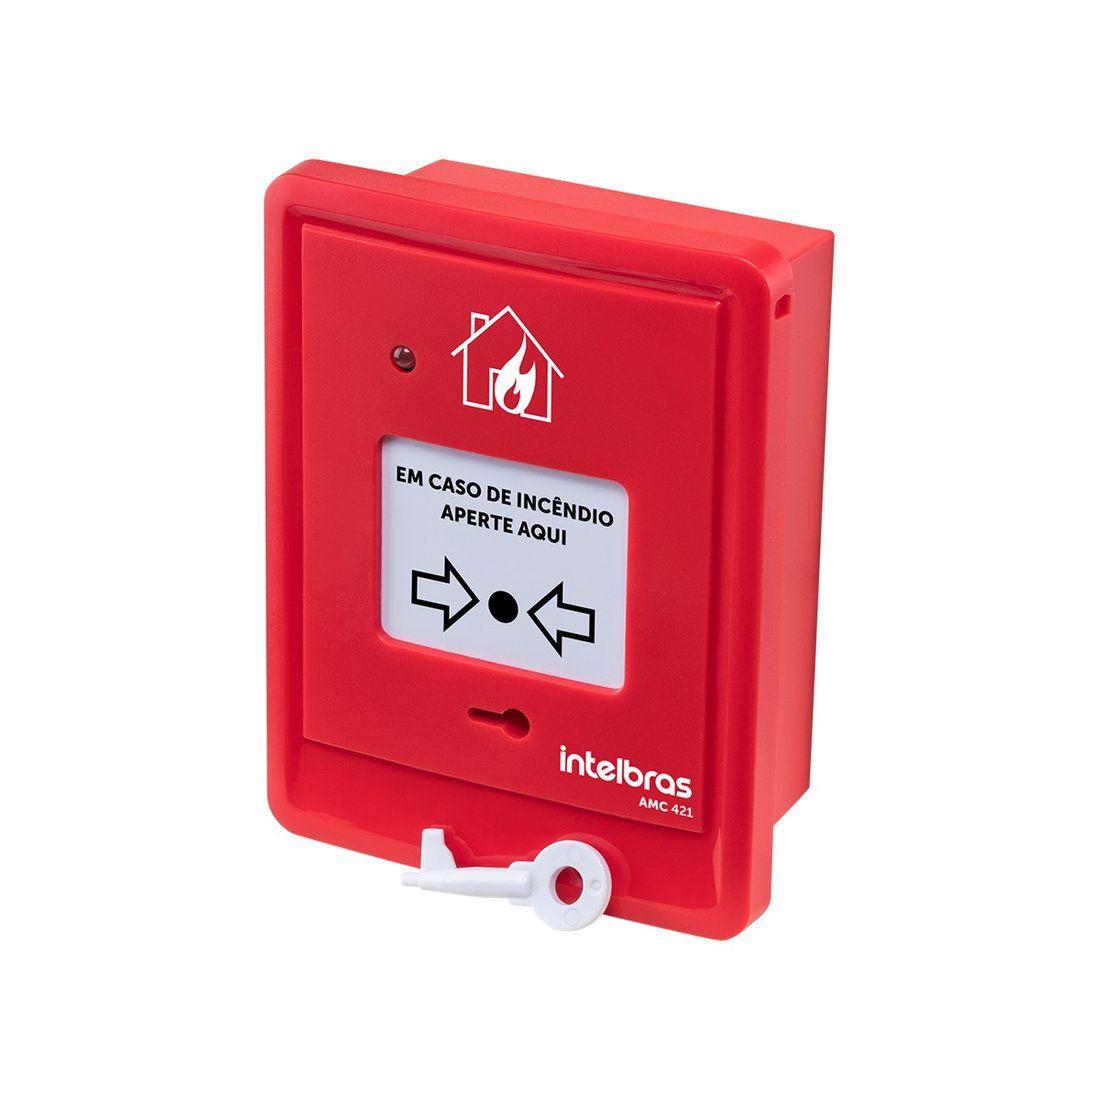 Acionador Manual de Alarme de Incêndio Intelbras AMC 421